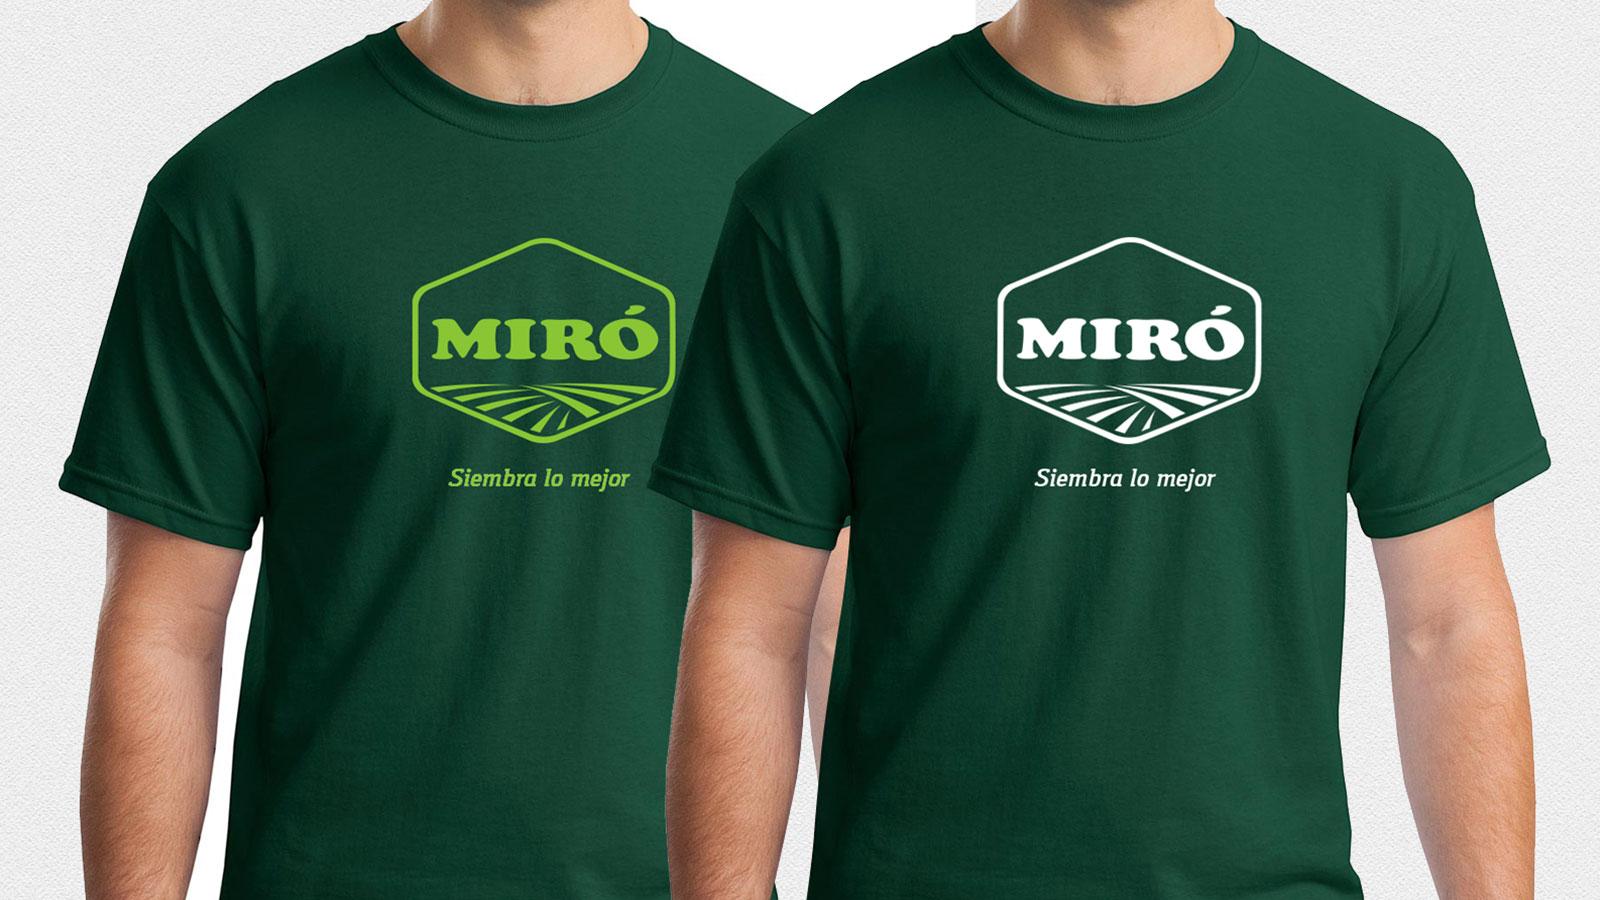 Arroz-Miro-N-06